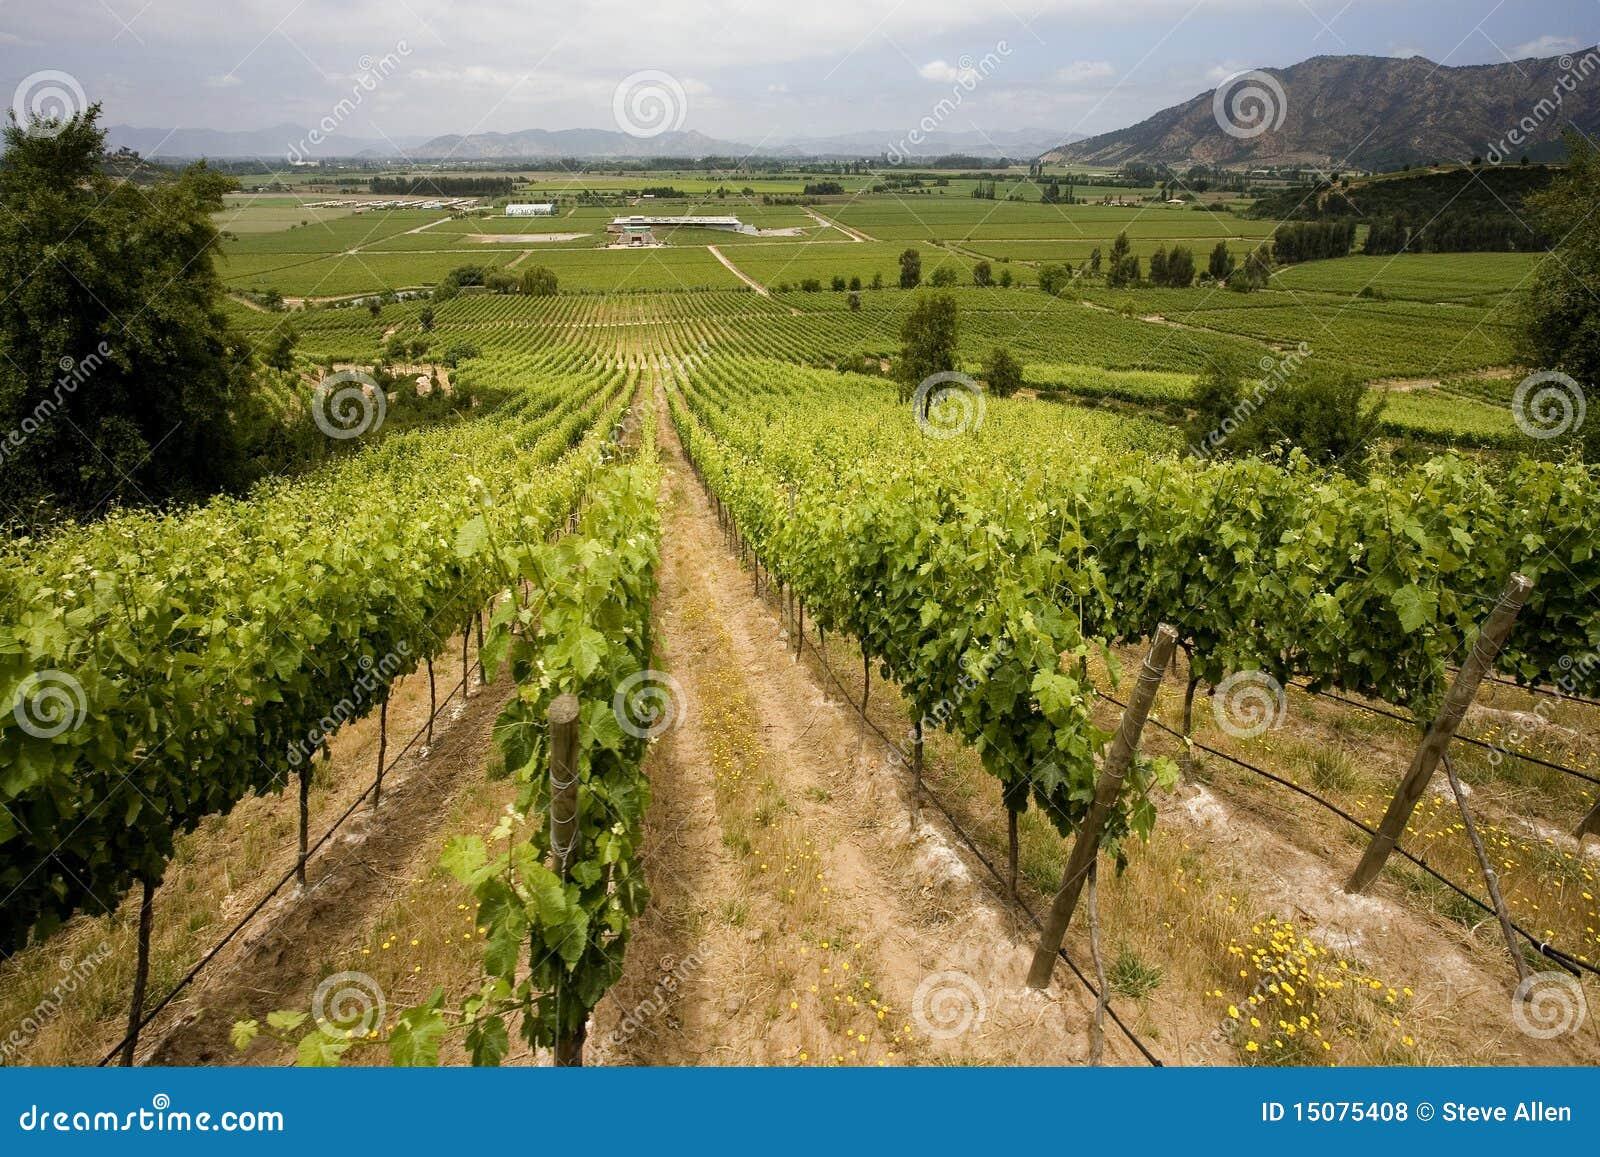 Vineyard - Wine Production - Chile